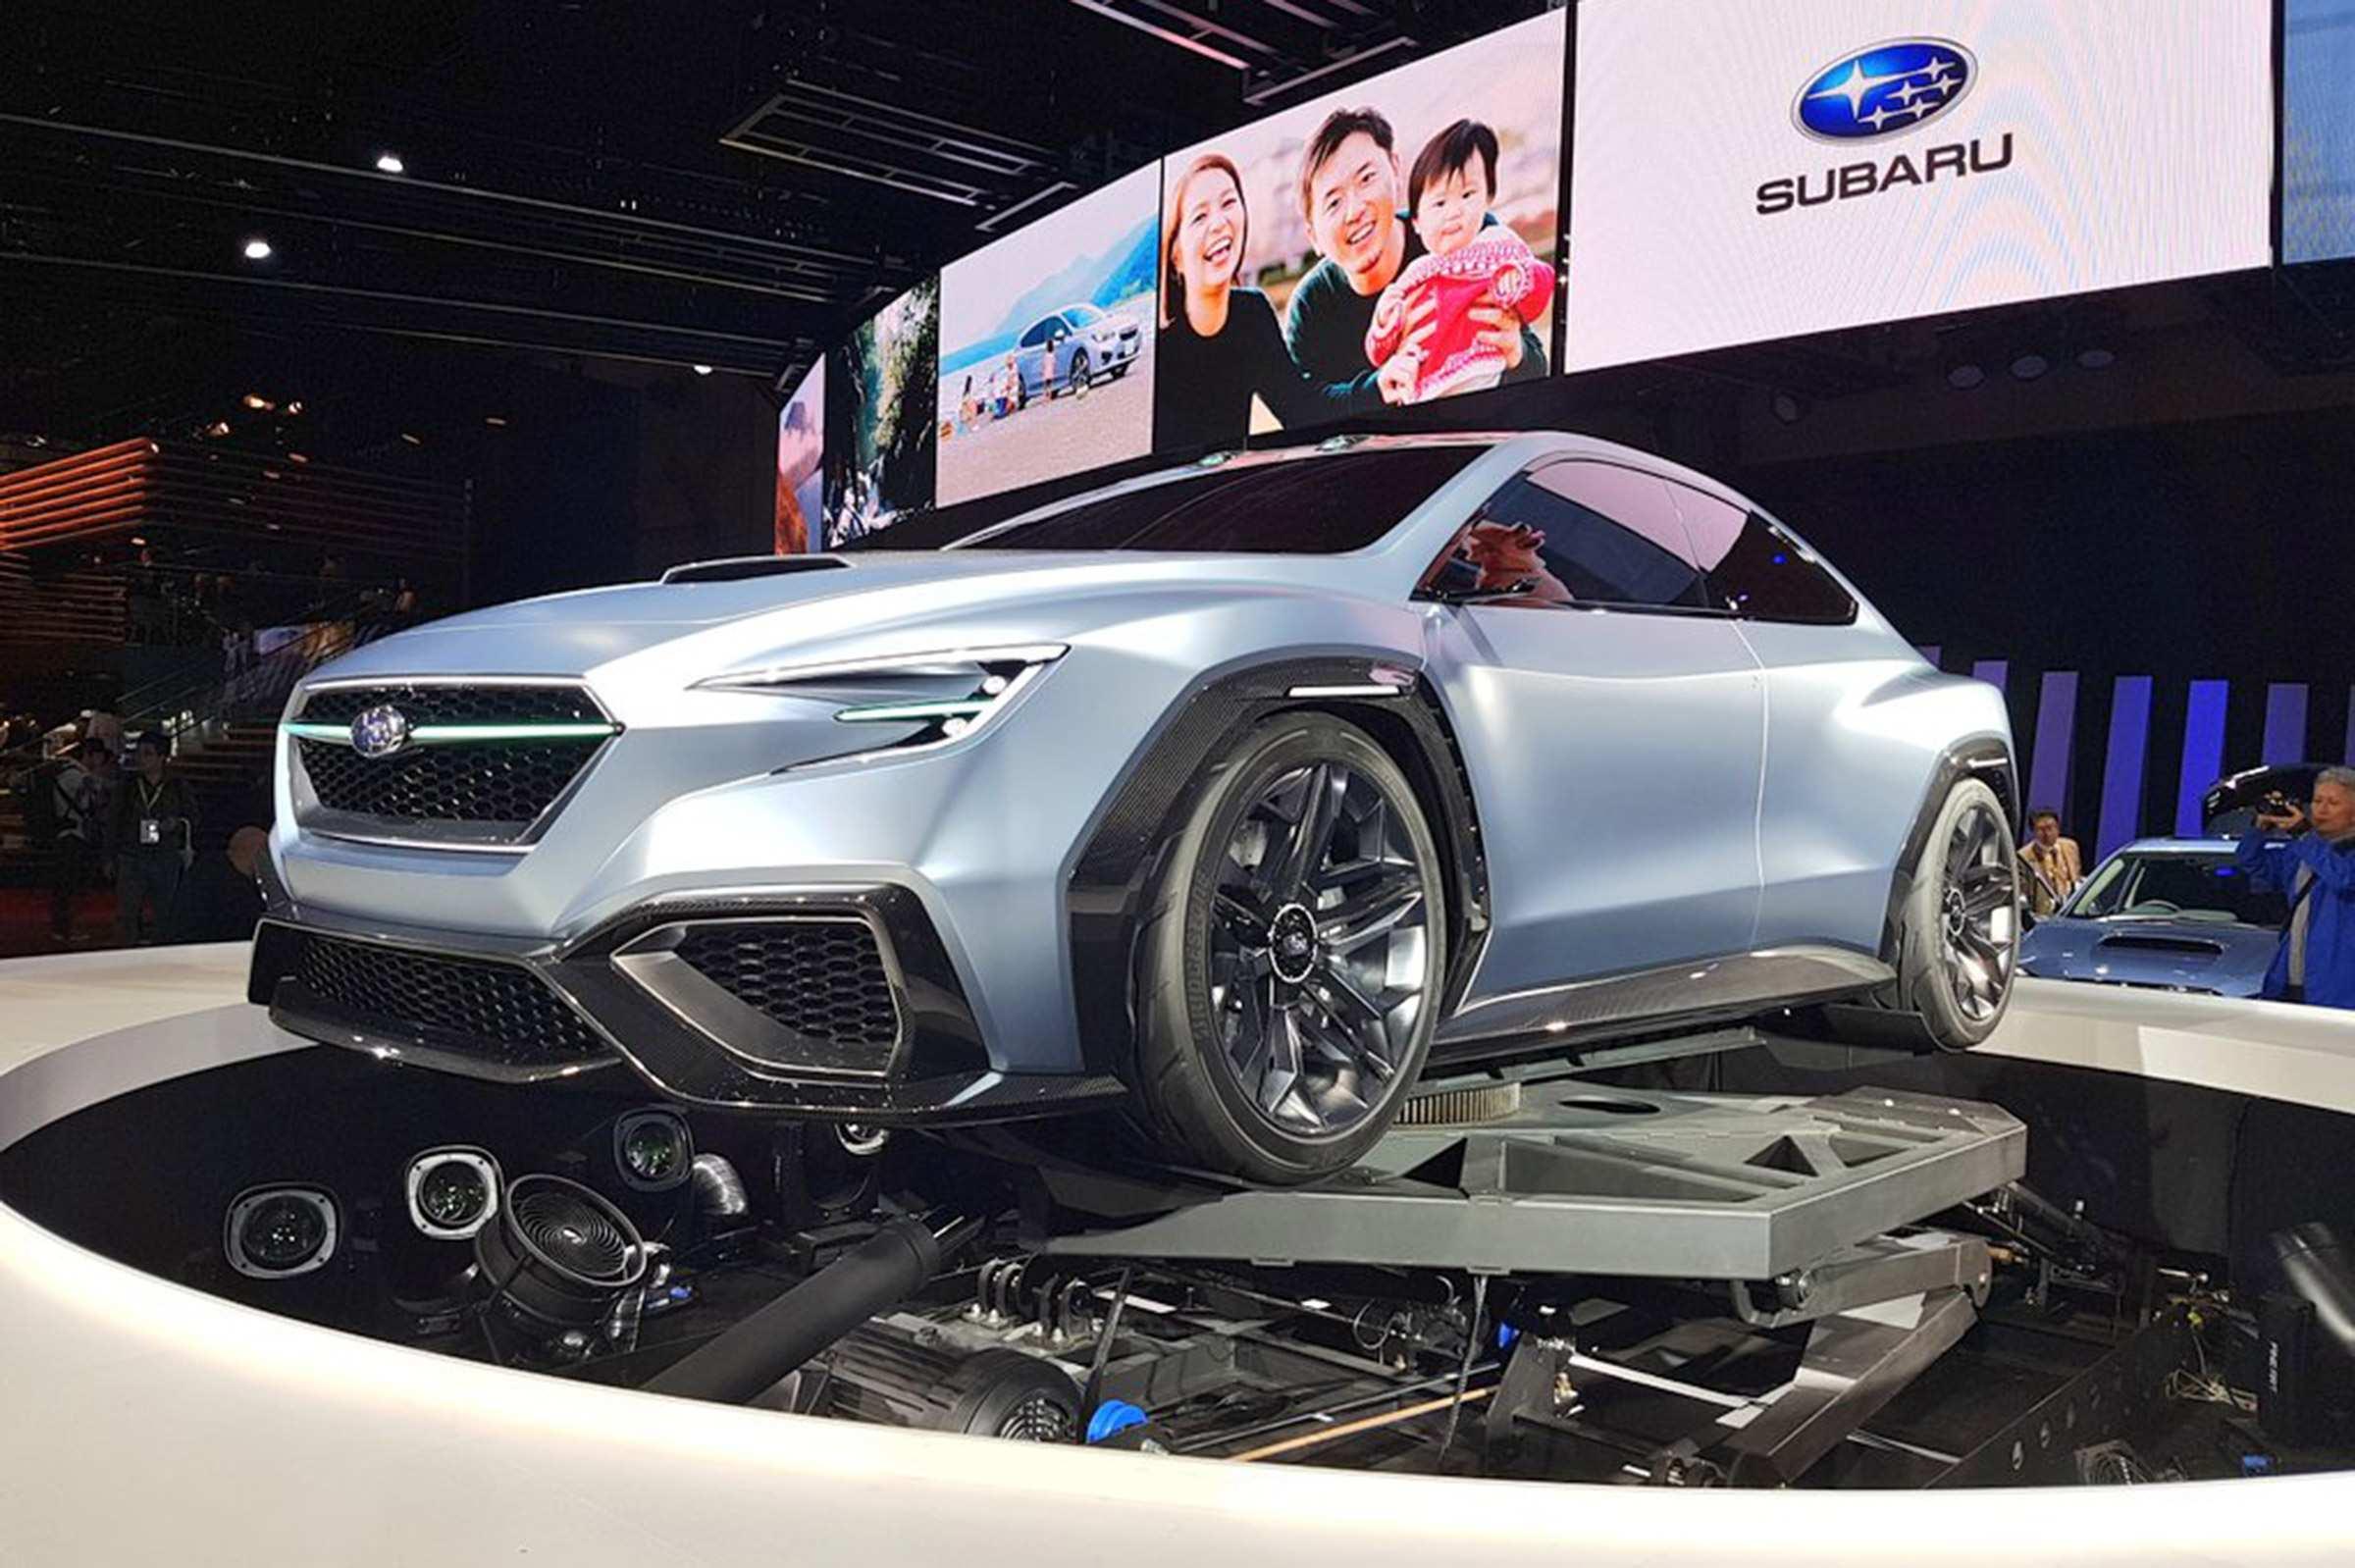 97 New Subaru Impreza Hybrid 2020 Interior for Subaru Impreza Hybrid 2020